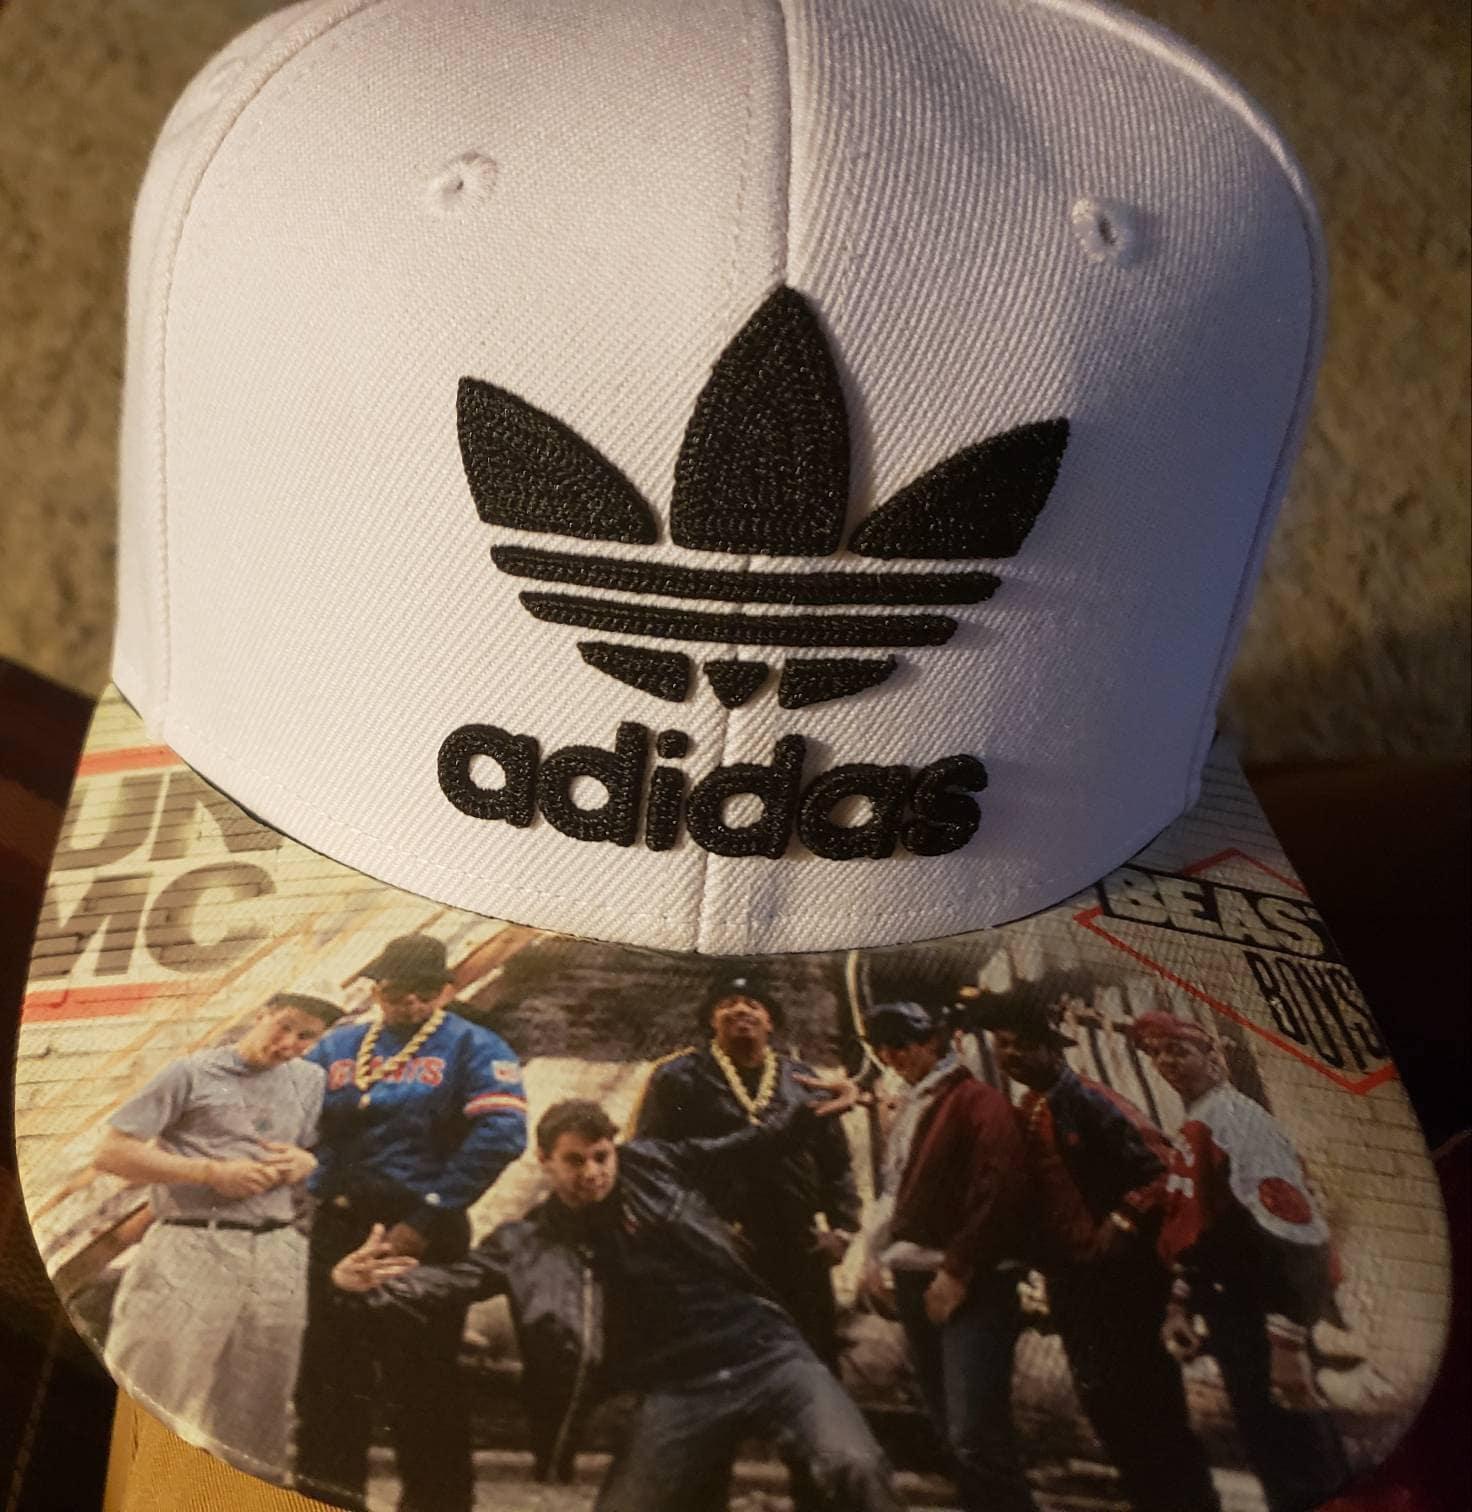 Daniel Wawro added a photo of their purchase